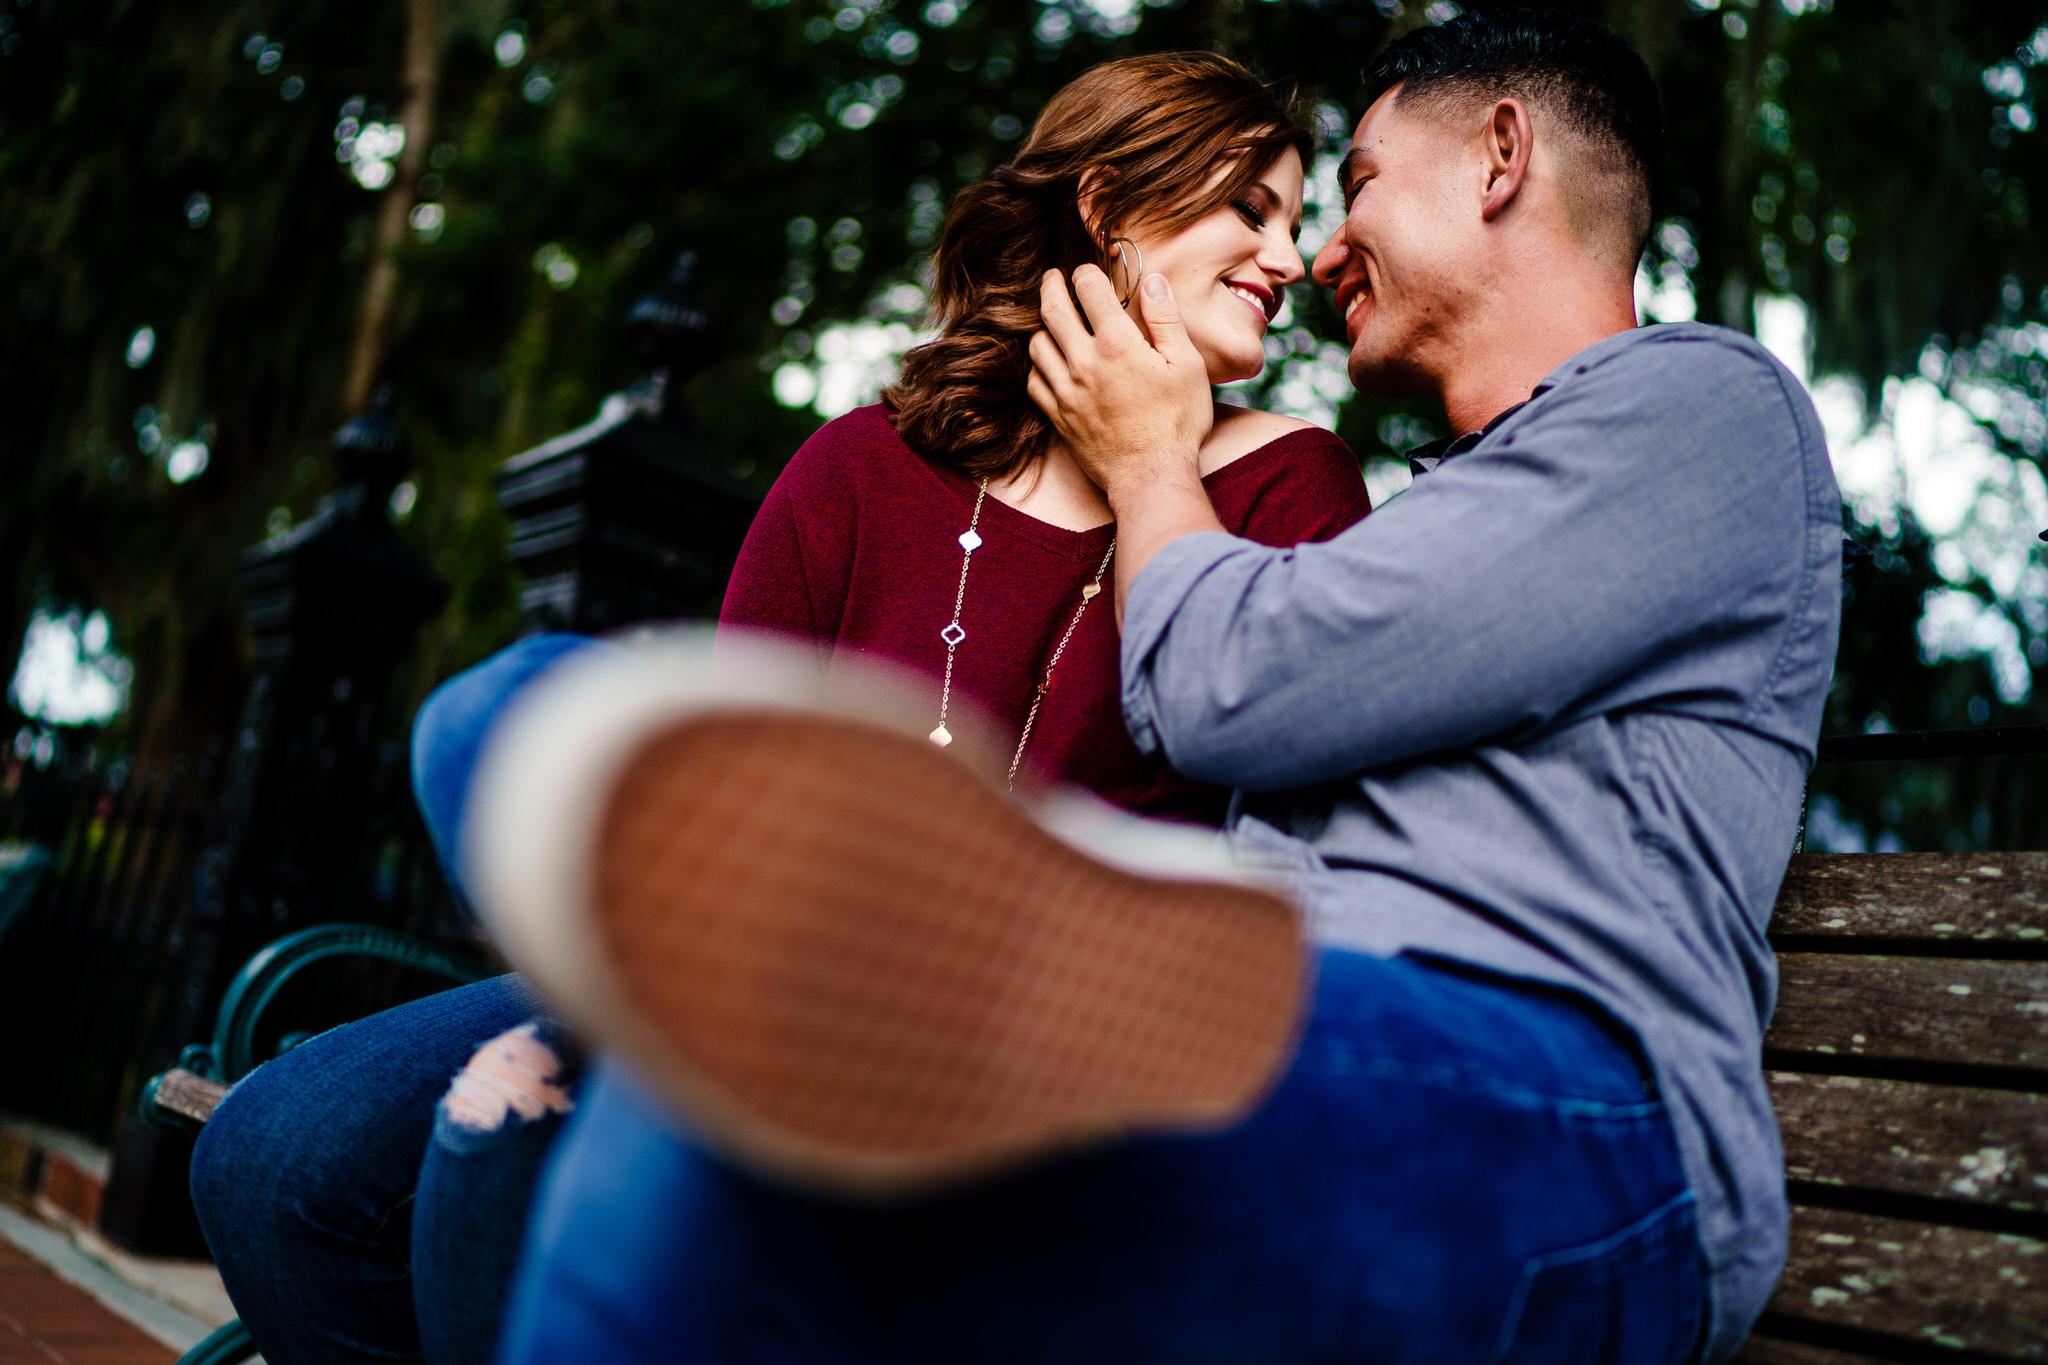 Shelby&Ye-New-Bern-Engagement-Photography-Chad-Winstead-007-1.jpg